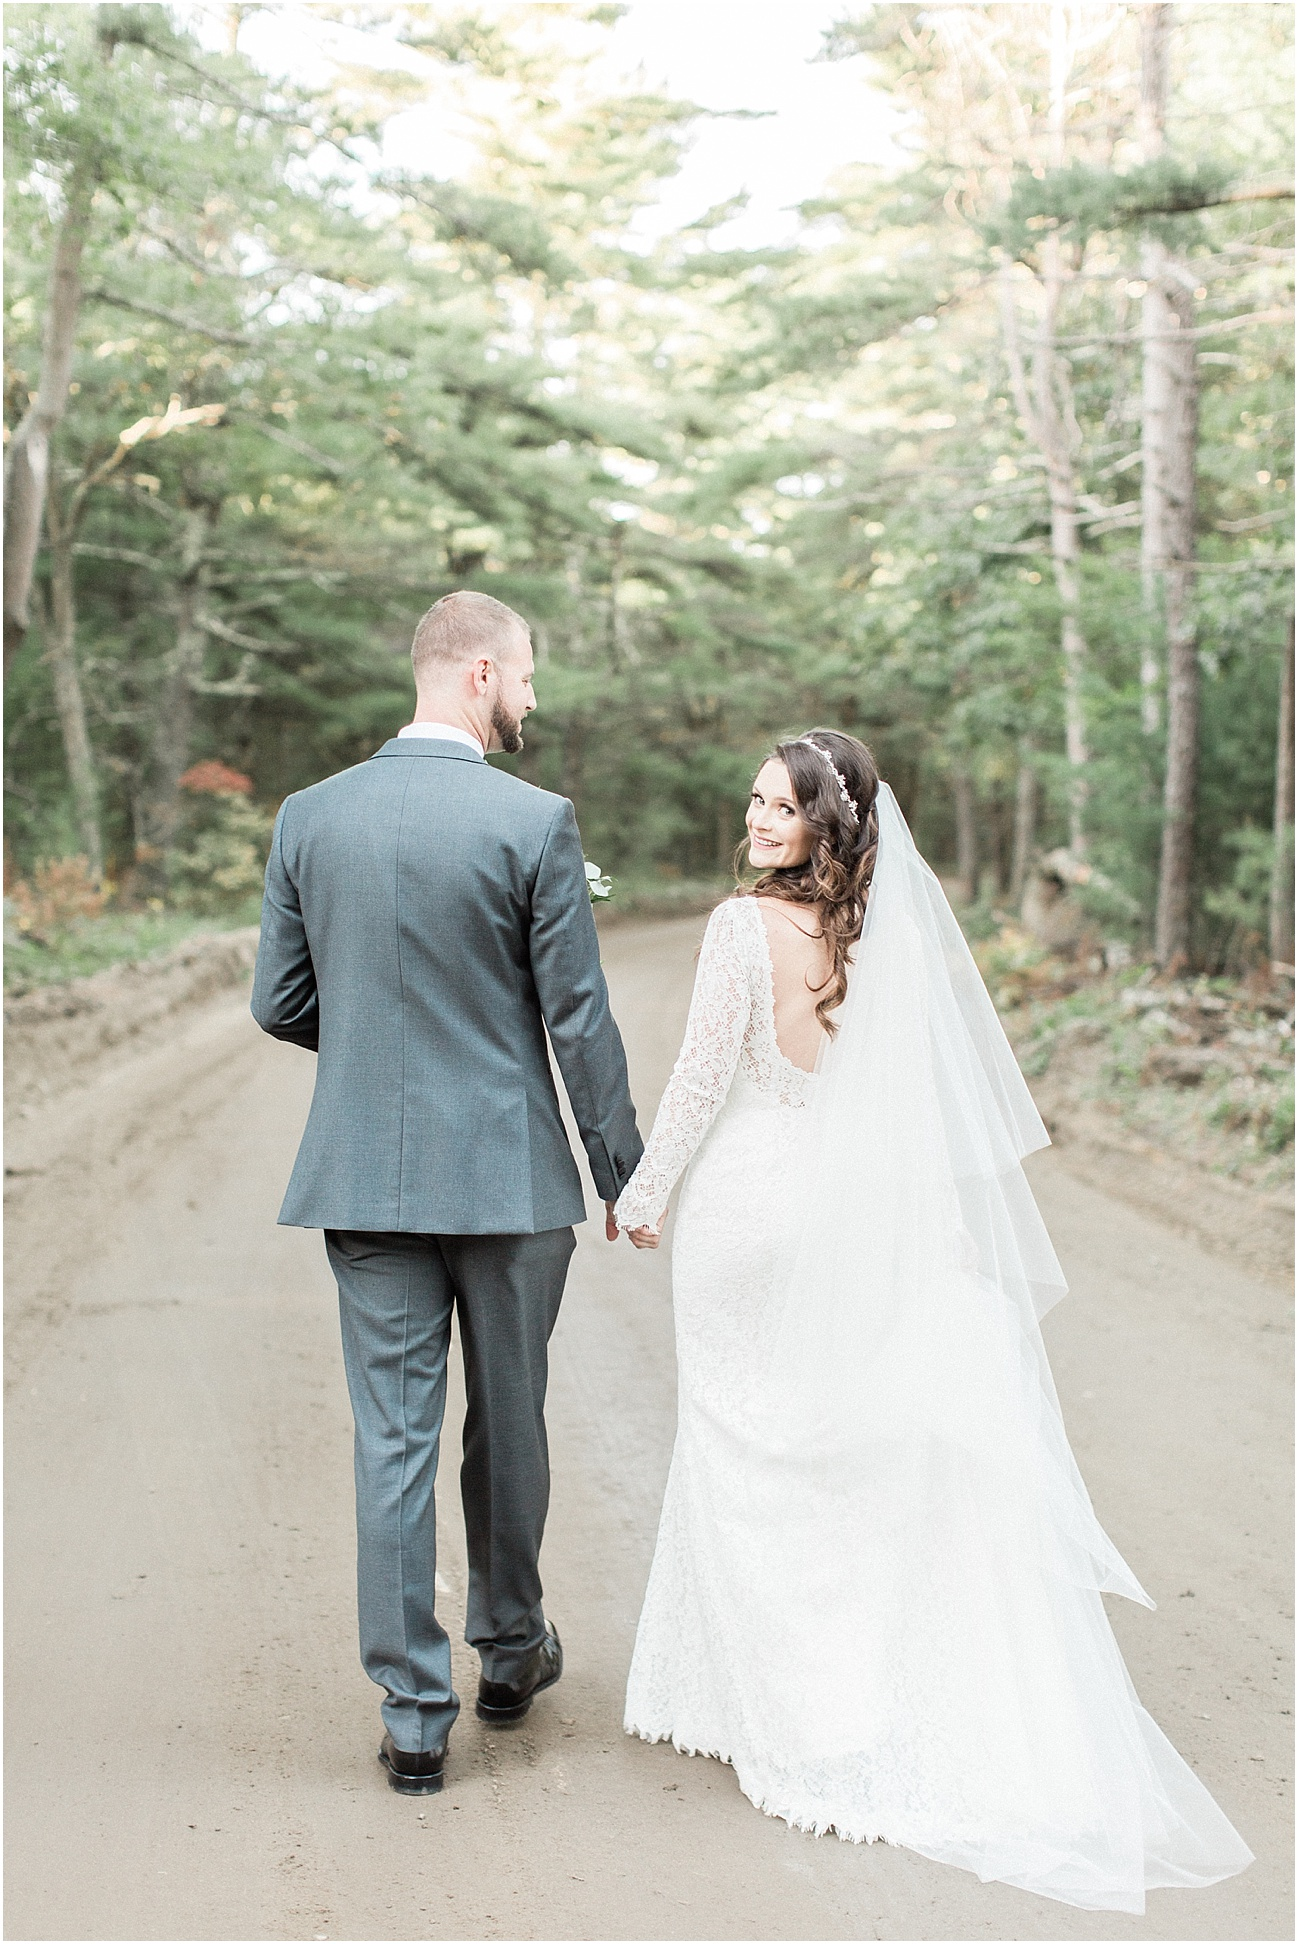 christina_frank_the_pavilion_at_pine_hills_fall_wine_cape_cod_boston_wedding_photographer_meredith_jane_photography_photo_1247.jpg